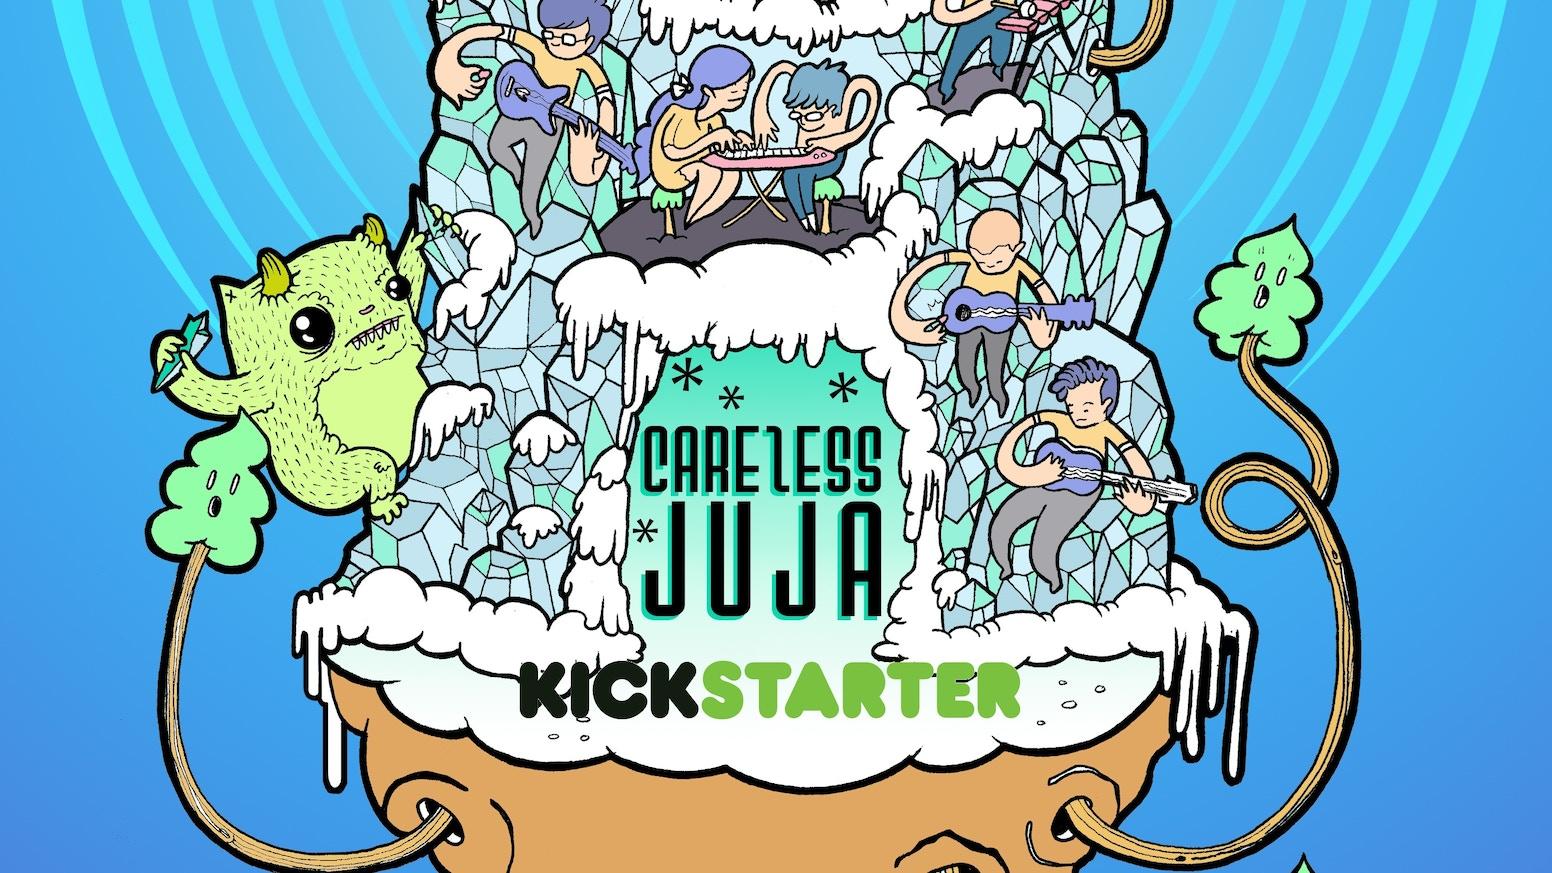 Careless Juja - Video Game Music! by Travis Vengroff